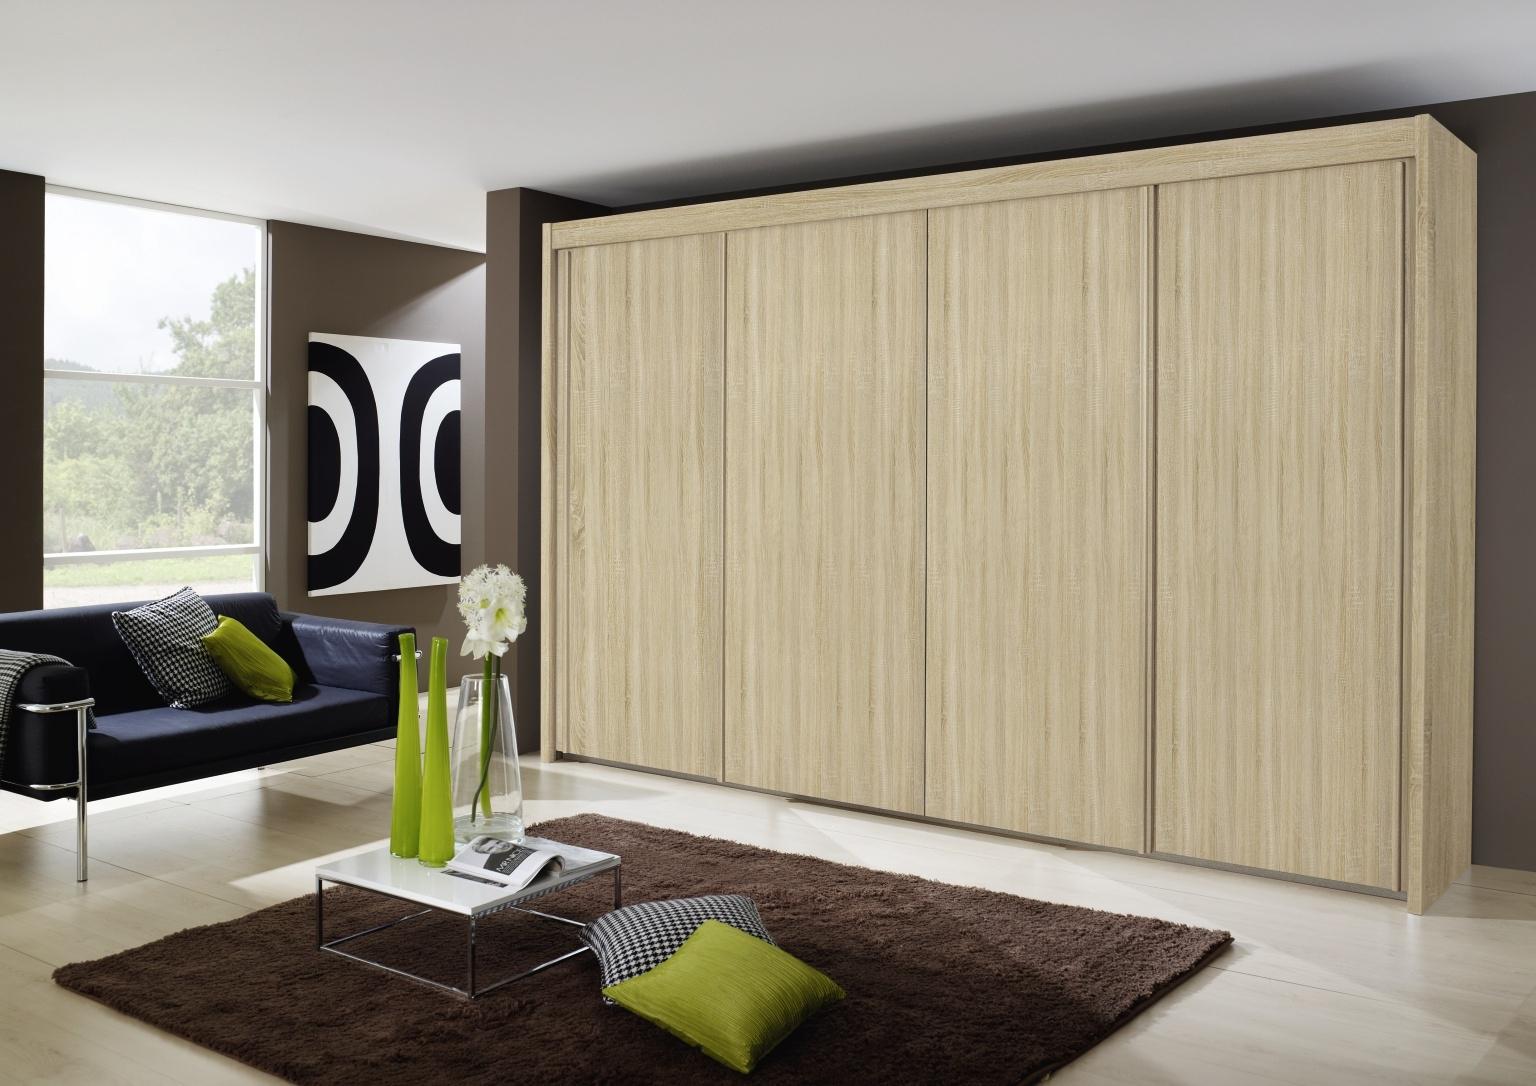 Rauch Imperial 4 Door Sliding Wardrobe in Sonoma Oak - W 350cm